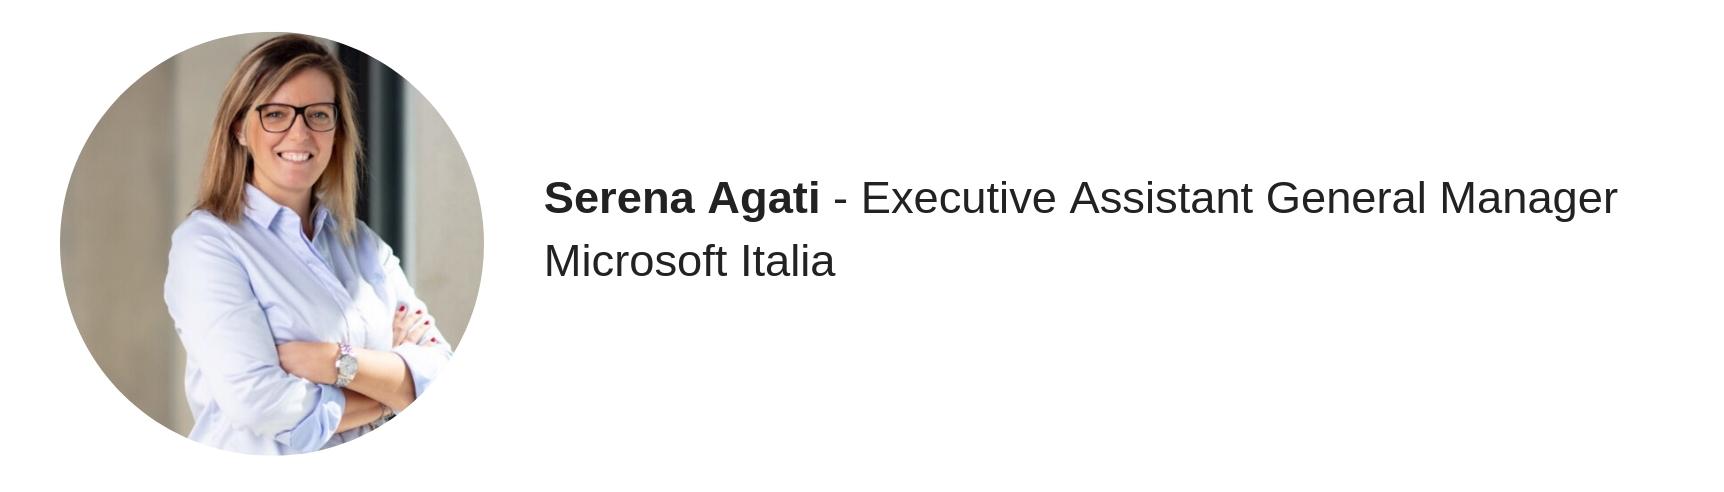 Serena Agati, Microsoft